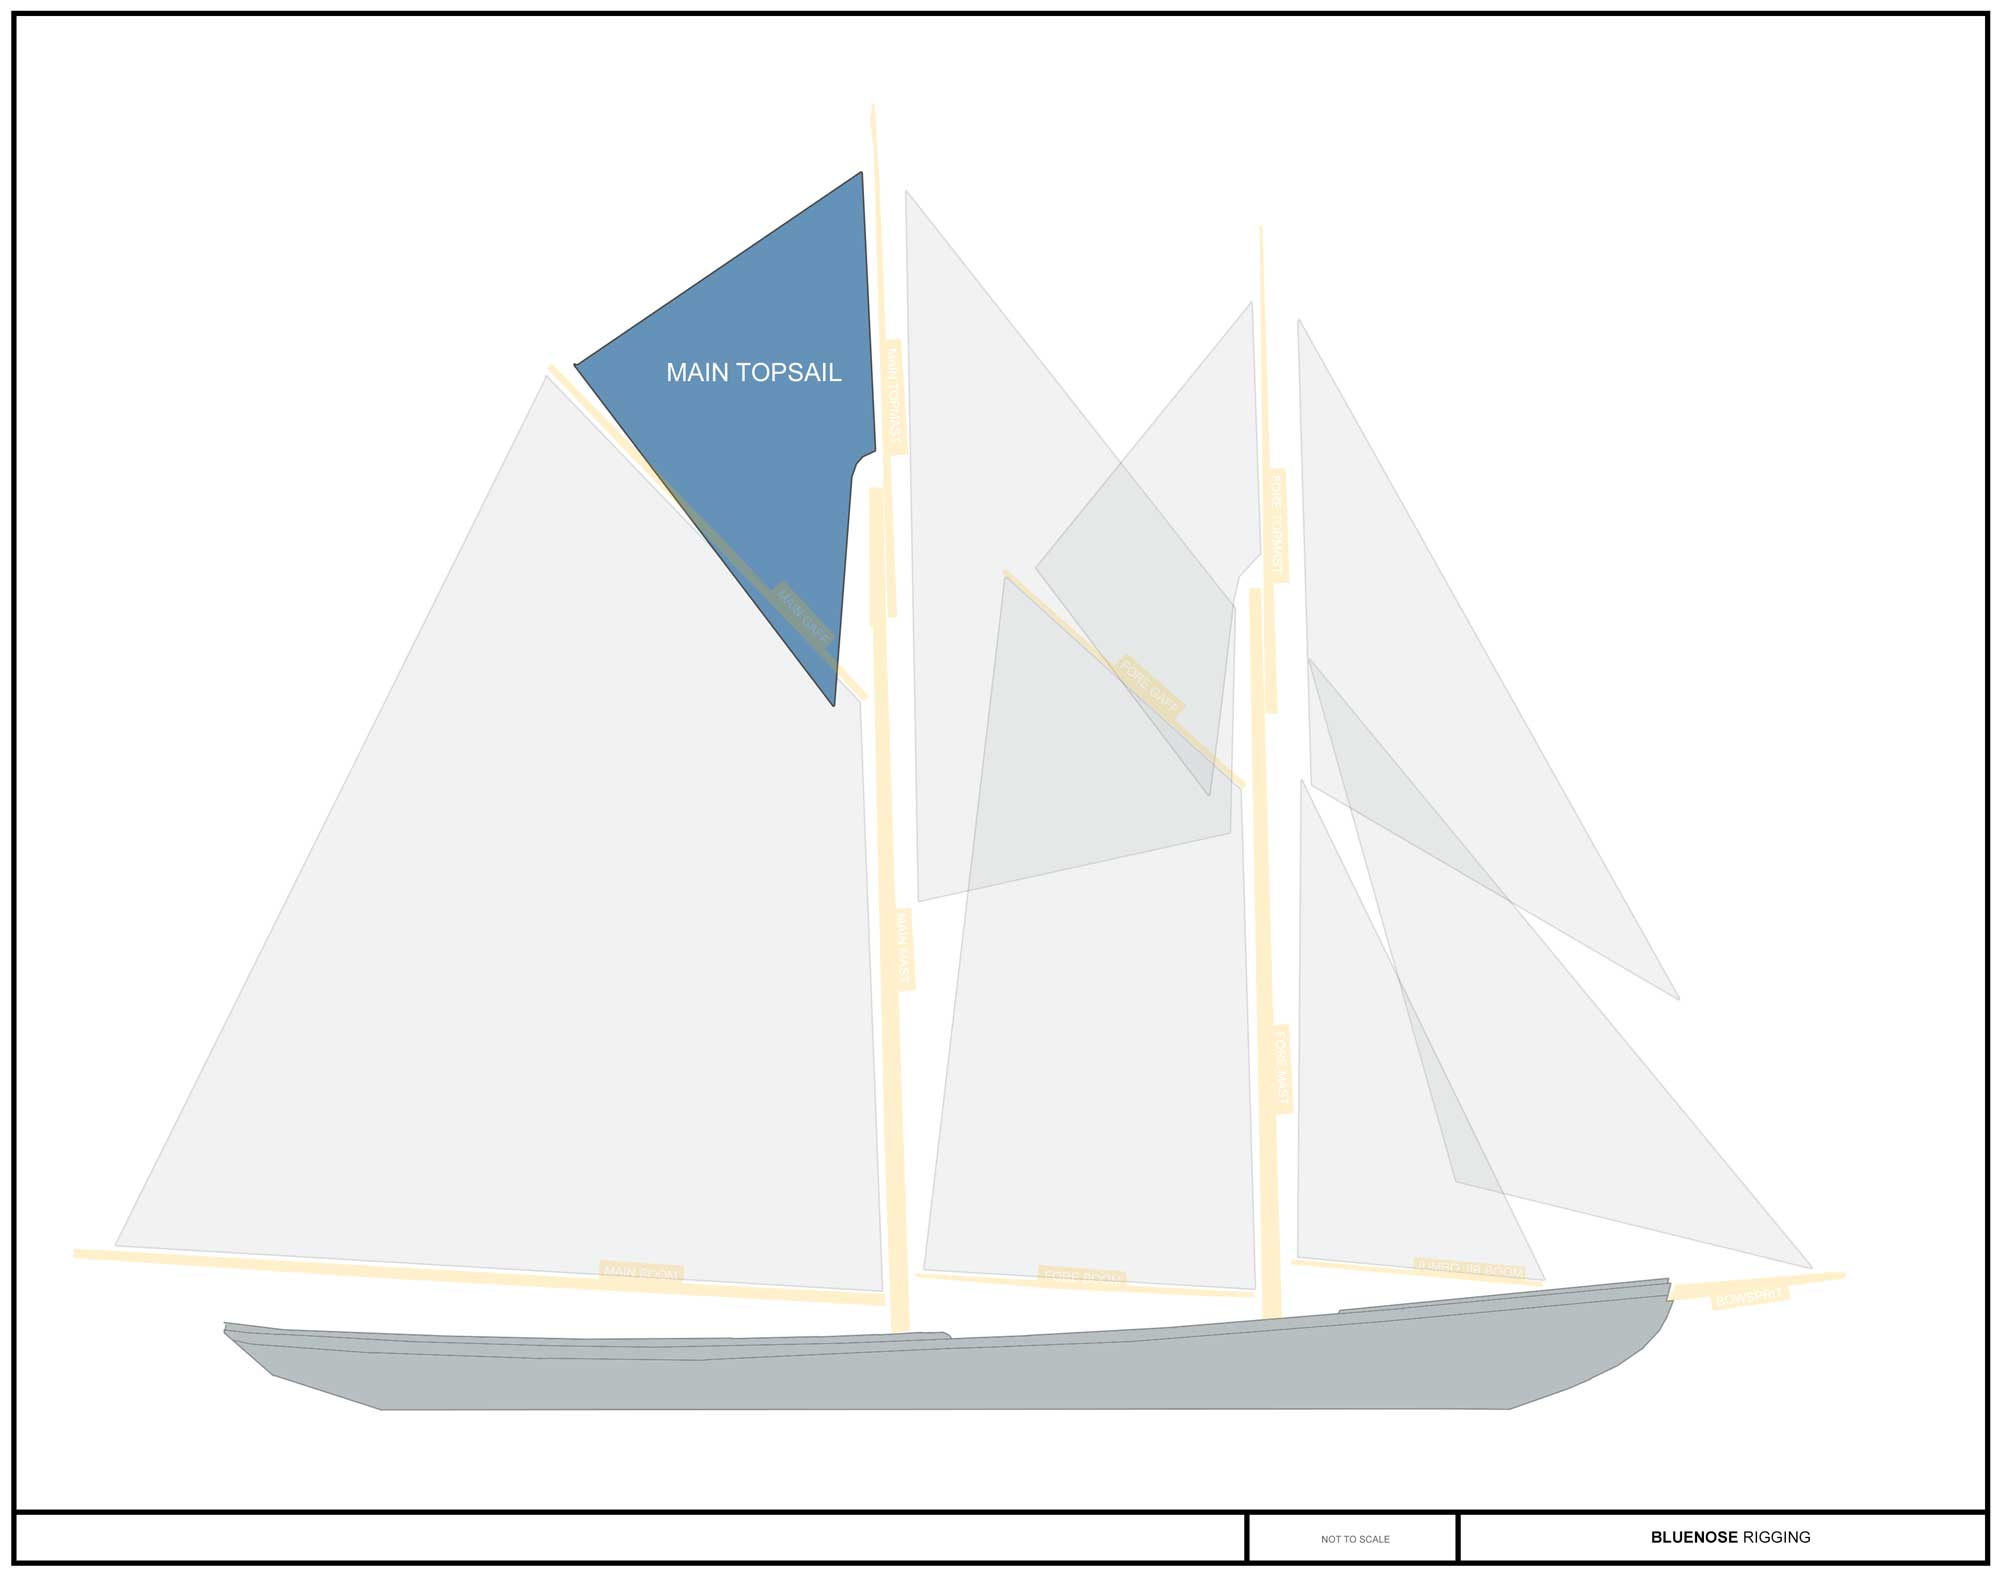 maintopsail